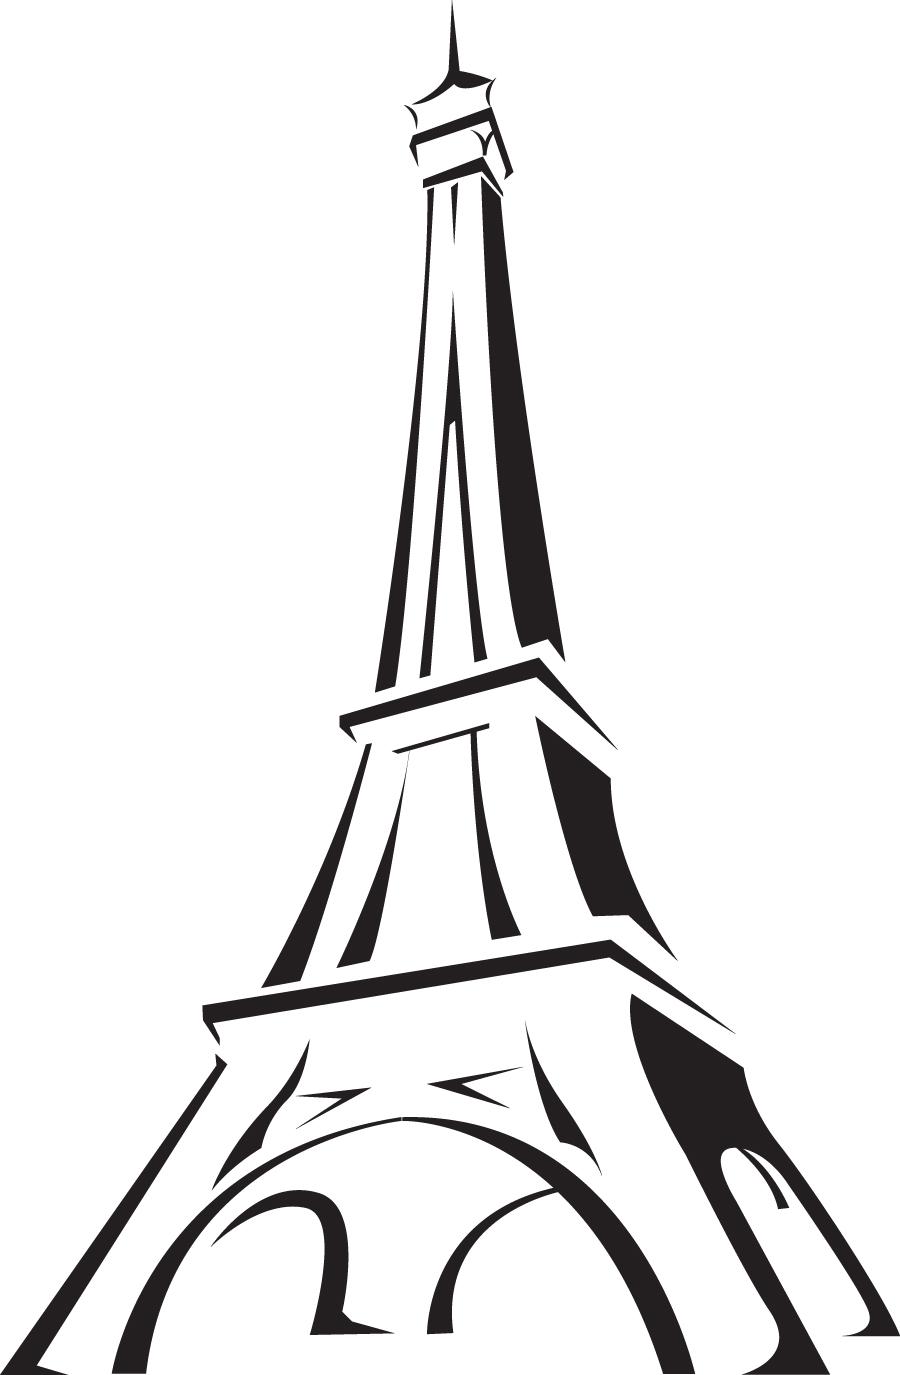 117 BKB1358 VINIL HOGAR TORRE EIFFEL - Tour Eiffel PNG